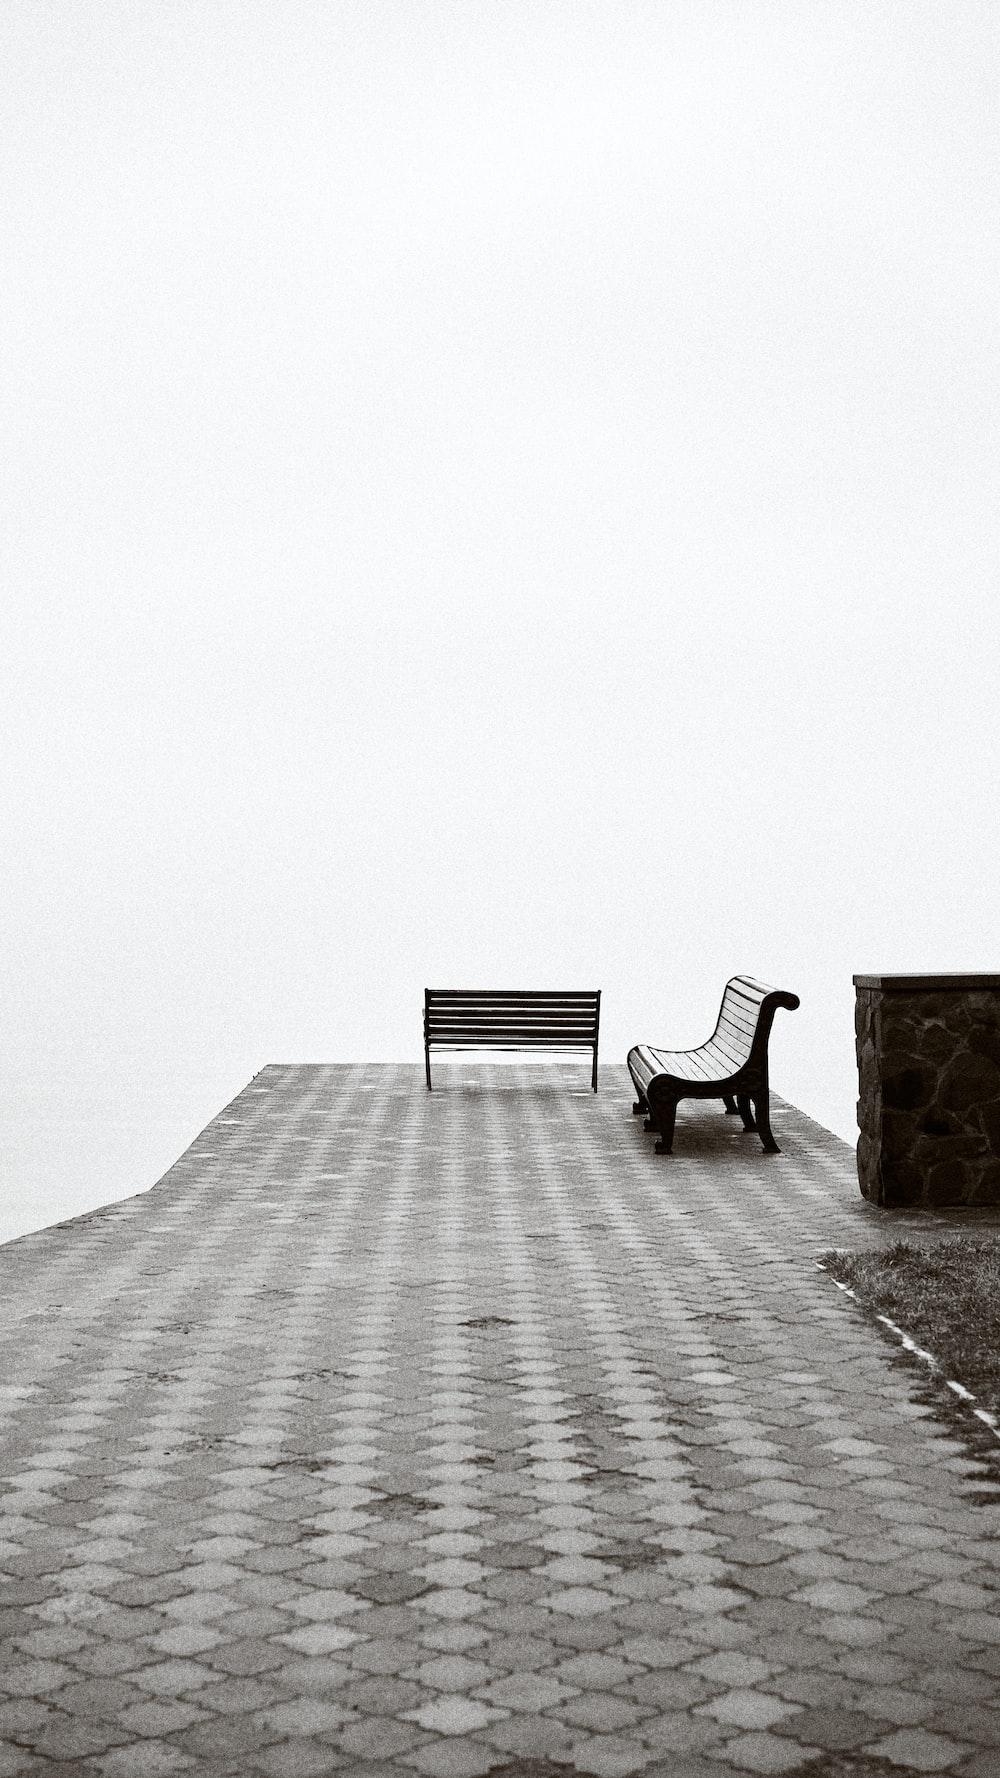 black metal bench on gray concrete floor